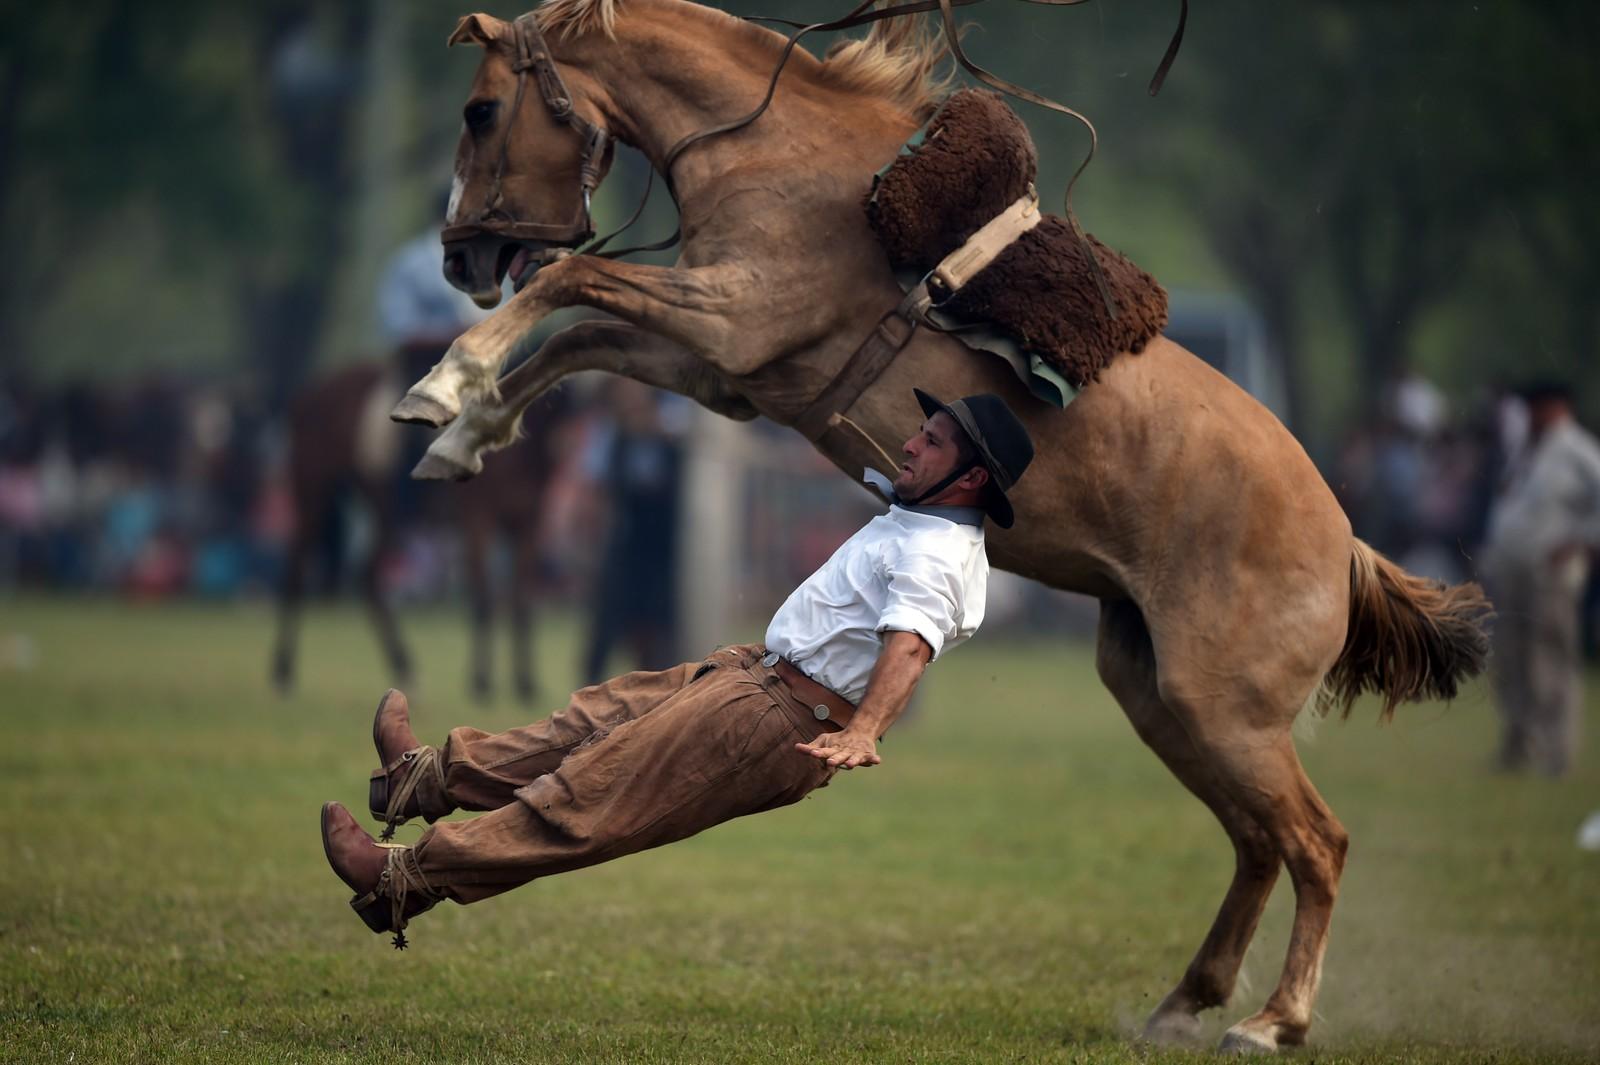 En cowboy kastes av hesten under en rodeo-forestilling i San Antonio de Areco, Argentina.